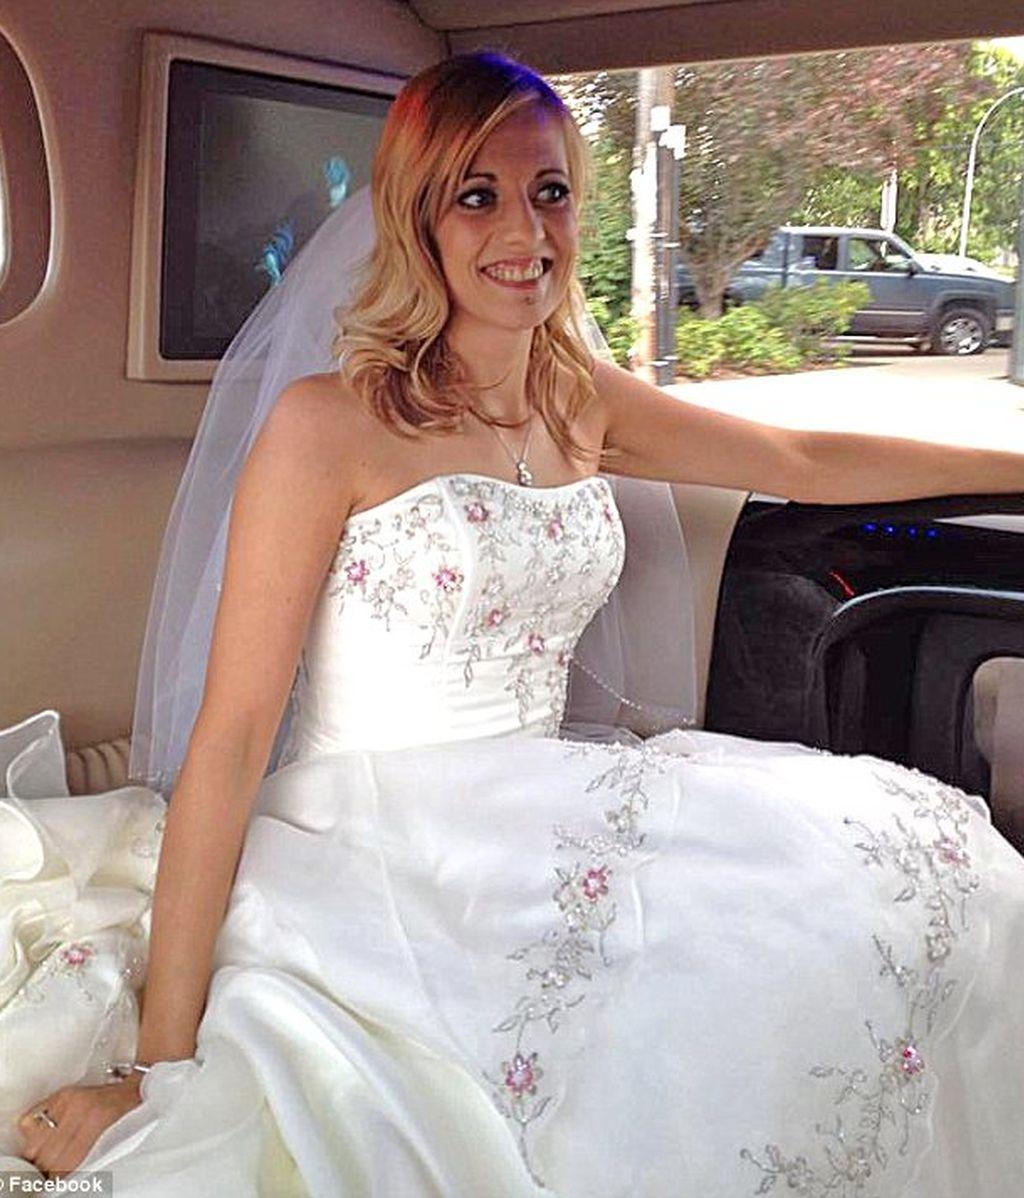 enferma de cáncer,crowdsourcing,Megan Wolfe,boda,celebra su boda,